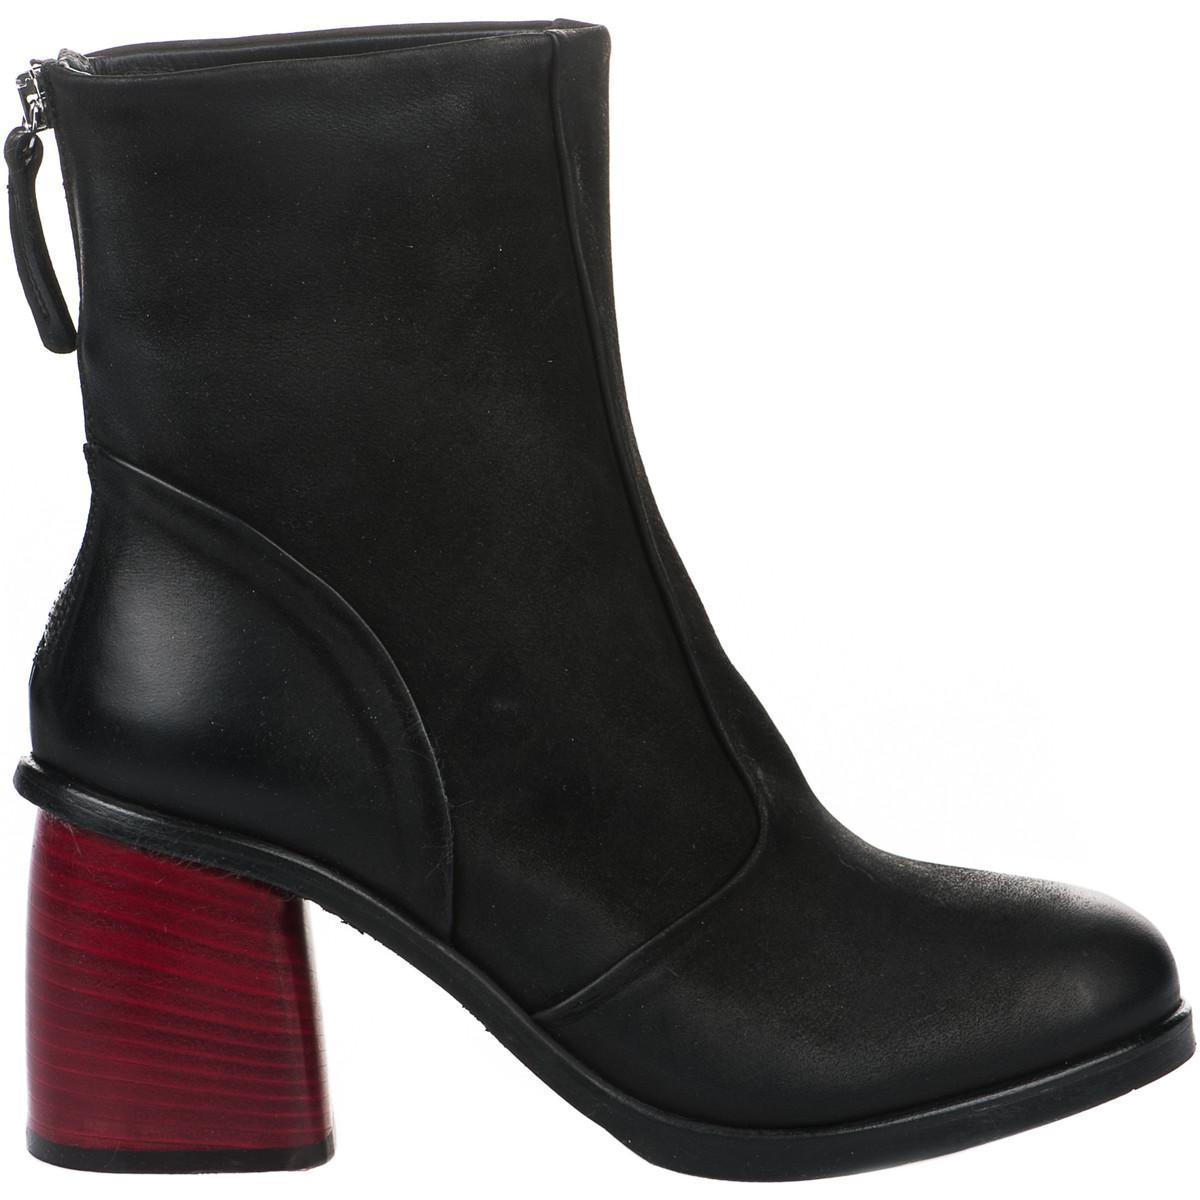 Femme Boots Femmes En Noir Miglio Lyst 36 ZPAqw8